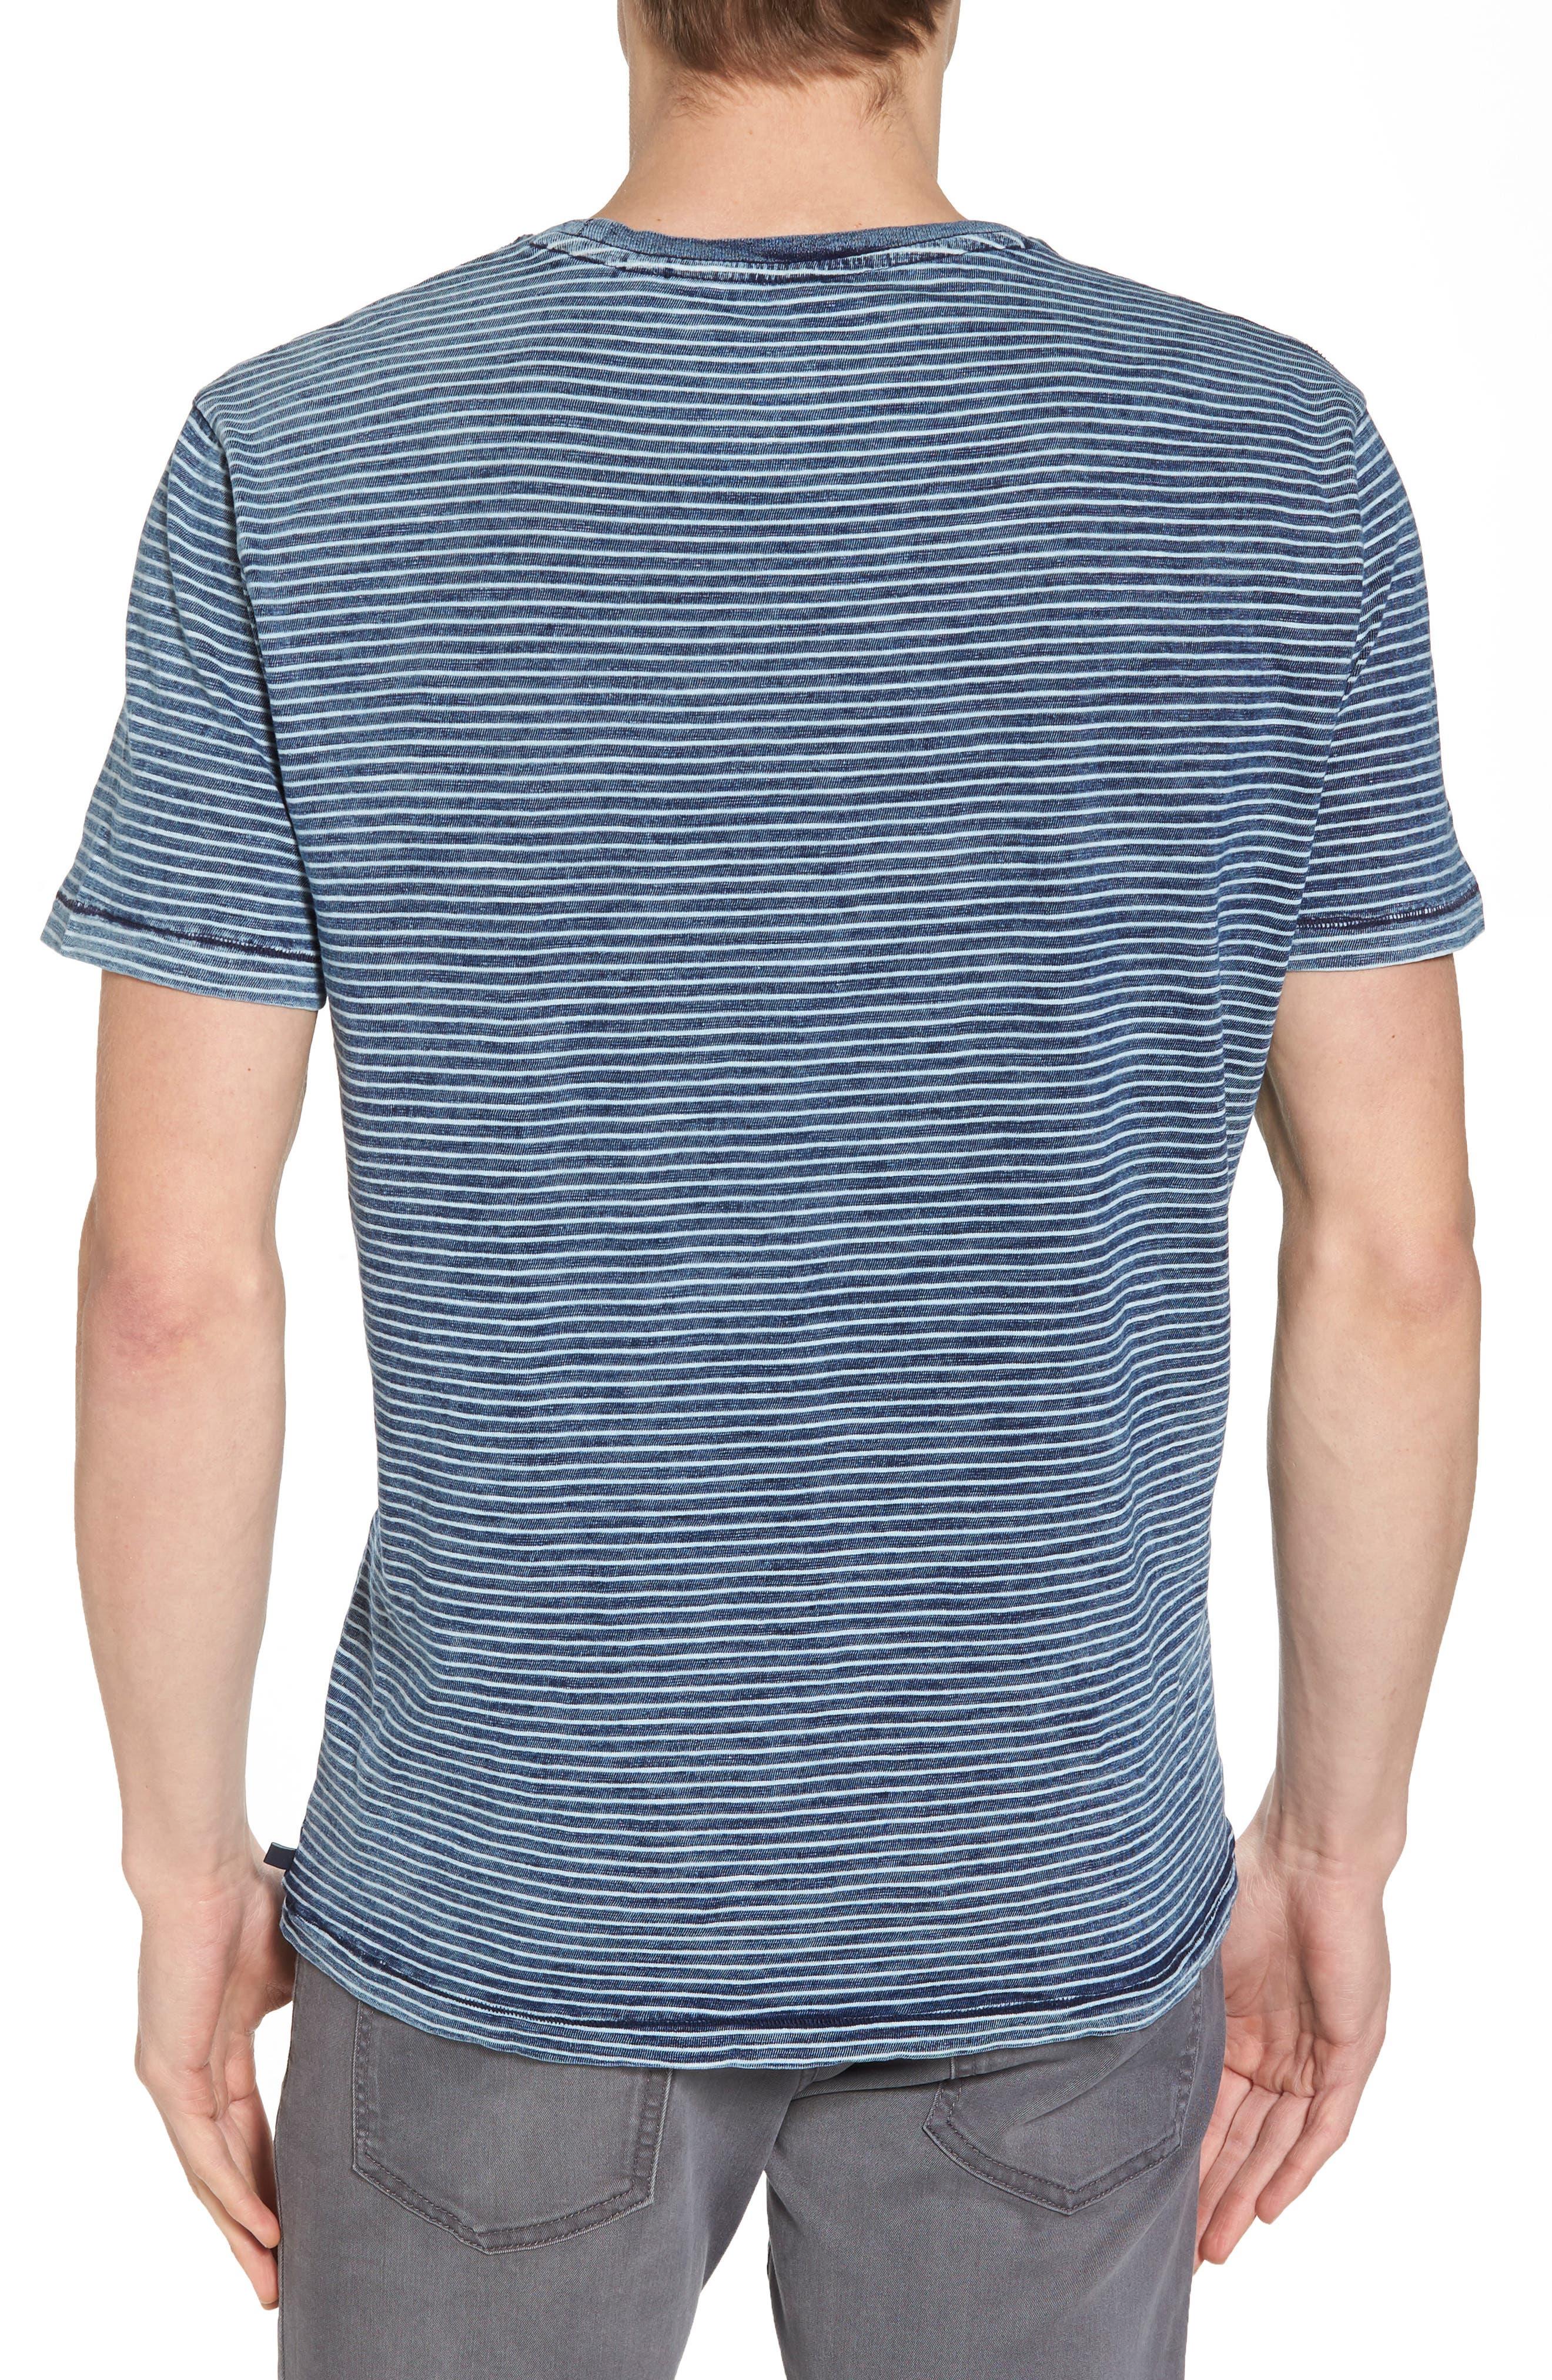 Julian Slim Fit Crewneck Shirt,                             Alternate thumbnail 6, color,